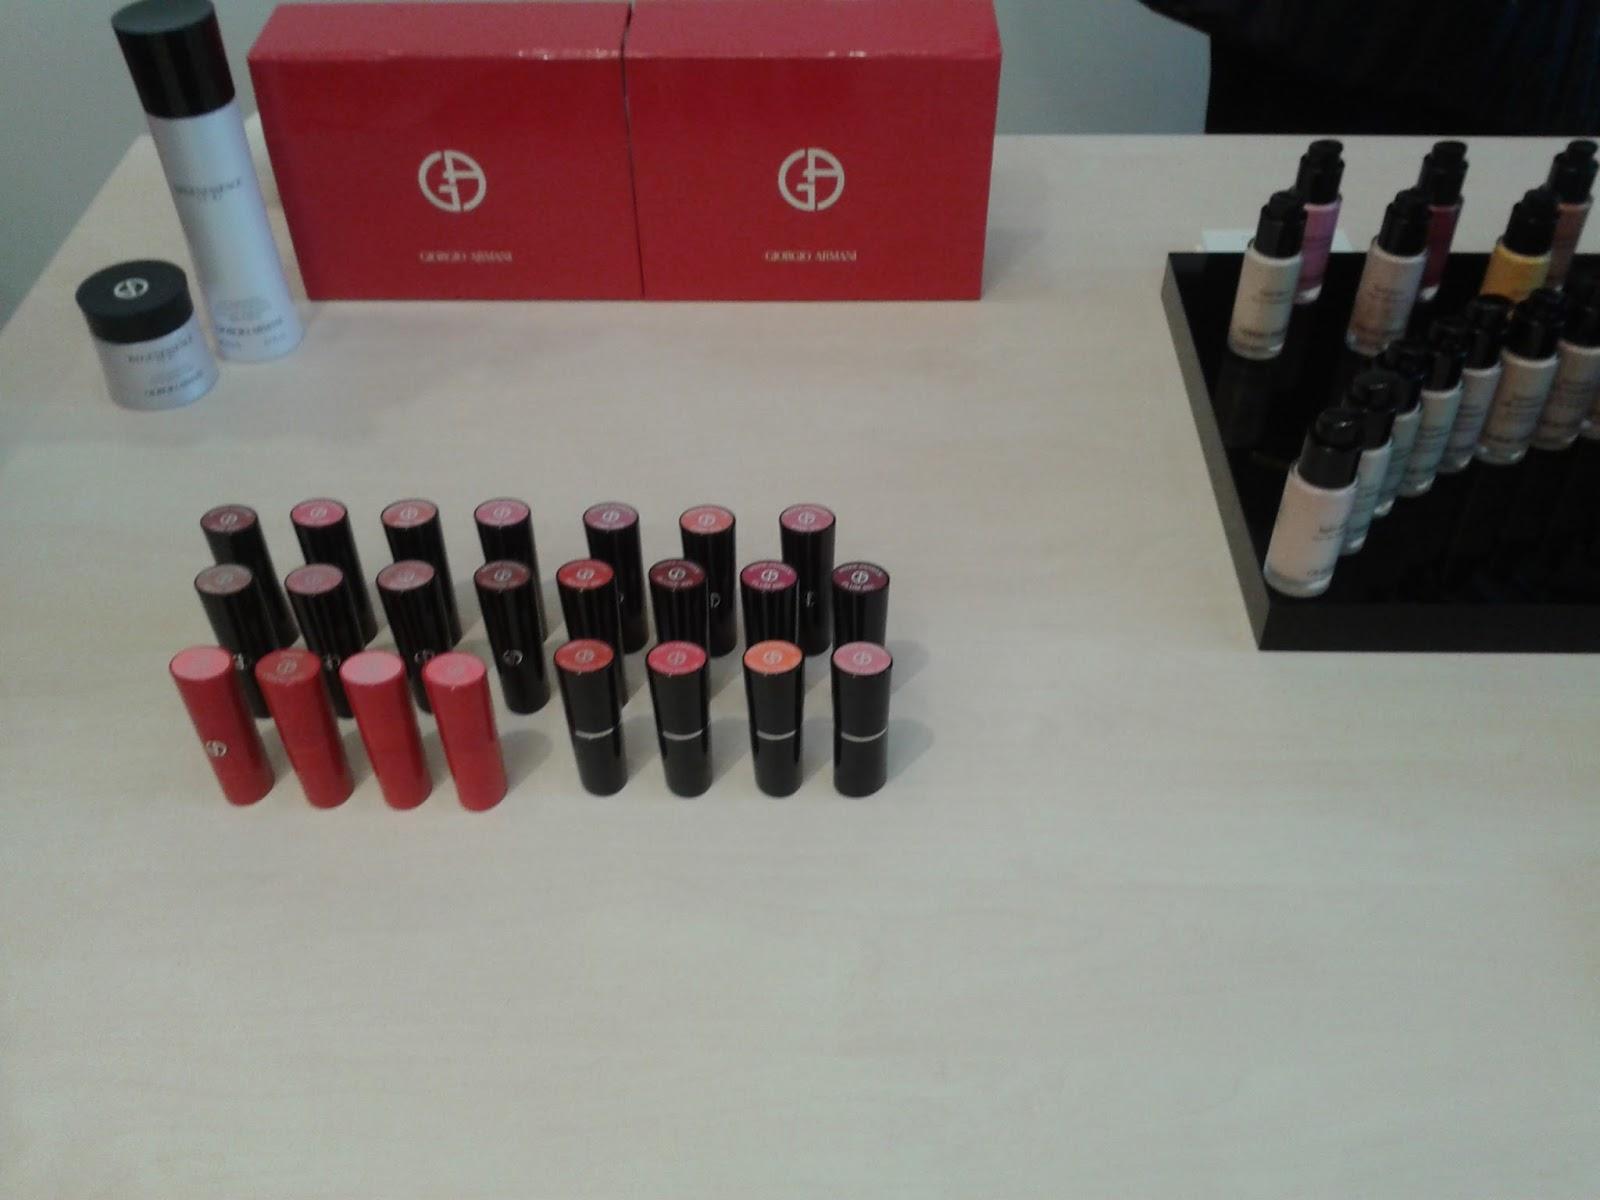 Armani CC lipsticks